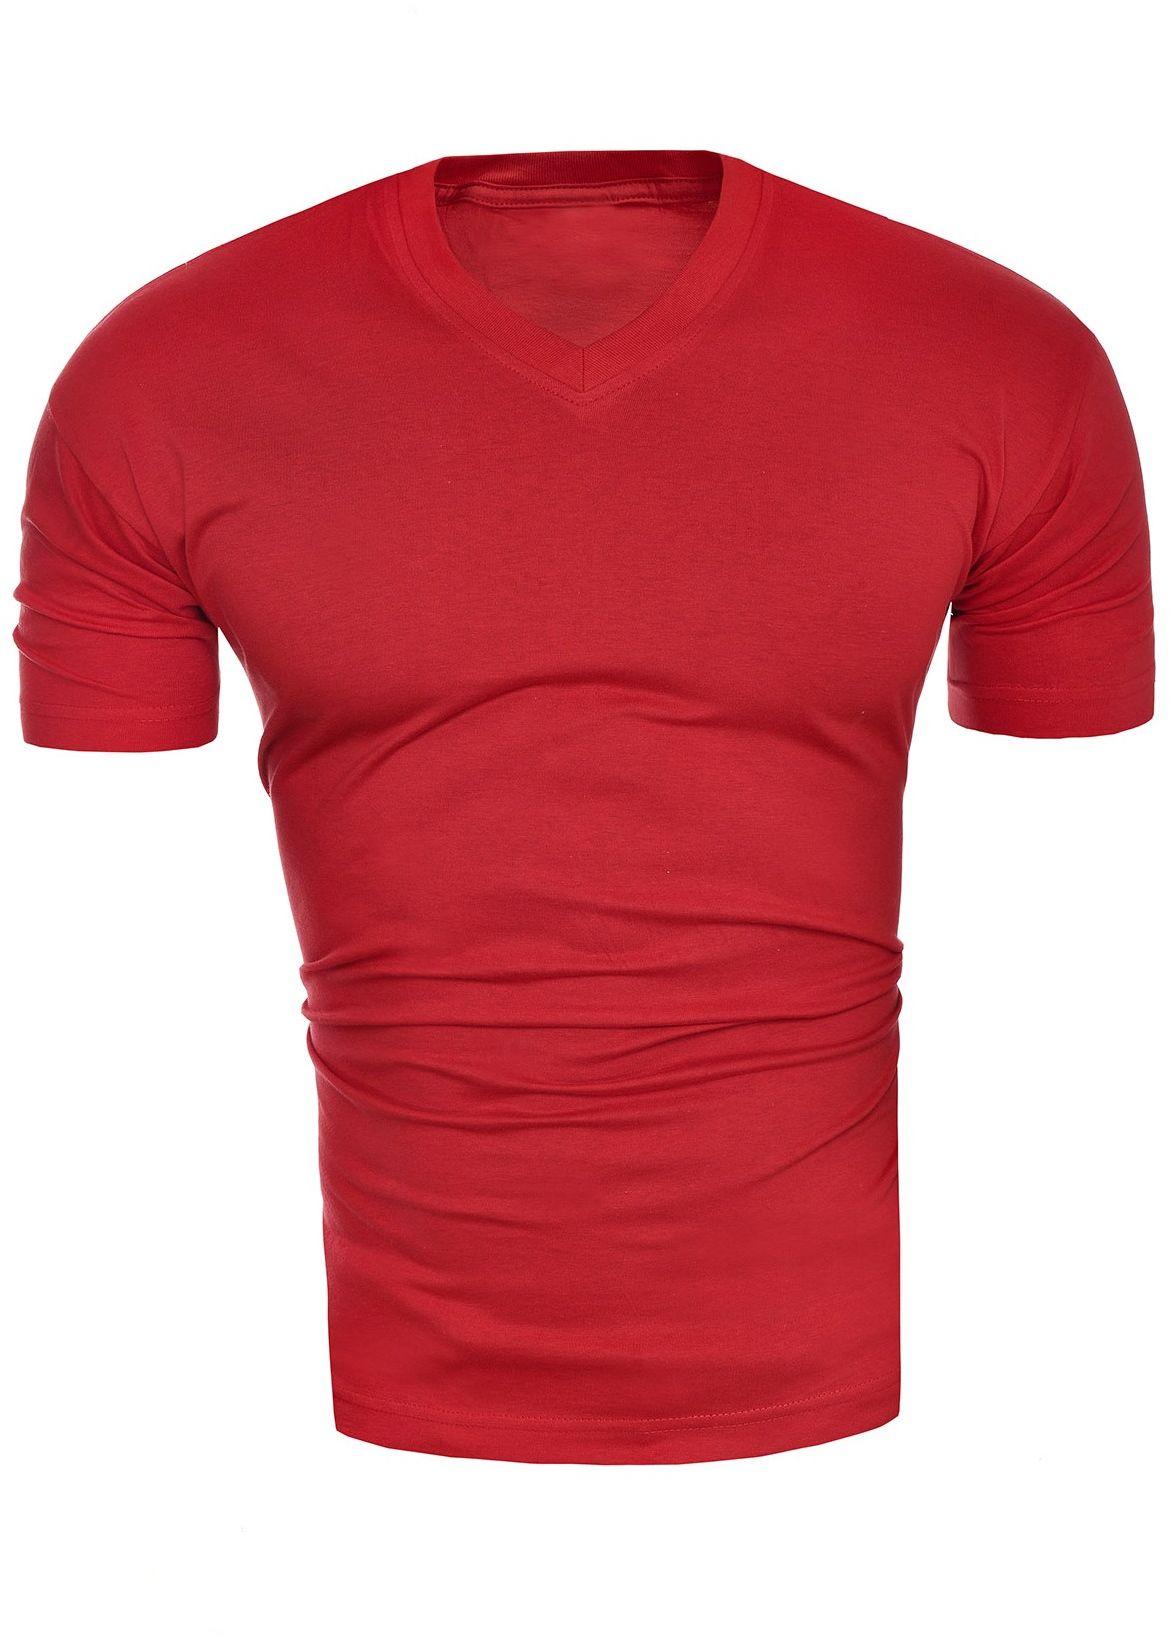 Męska koszulka t-shirt v-neck - czerwona